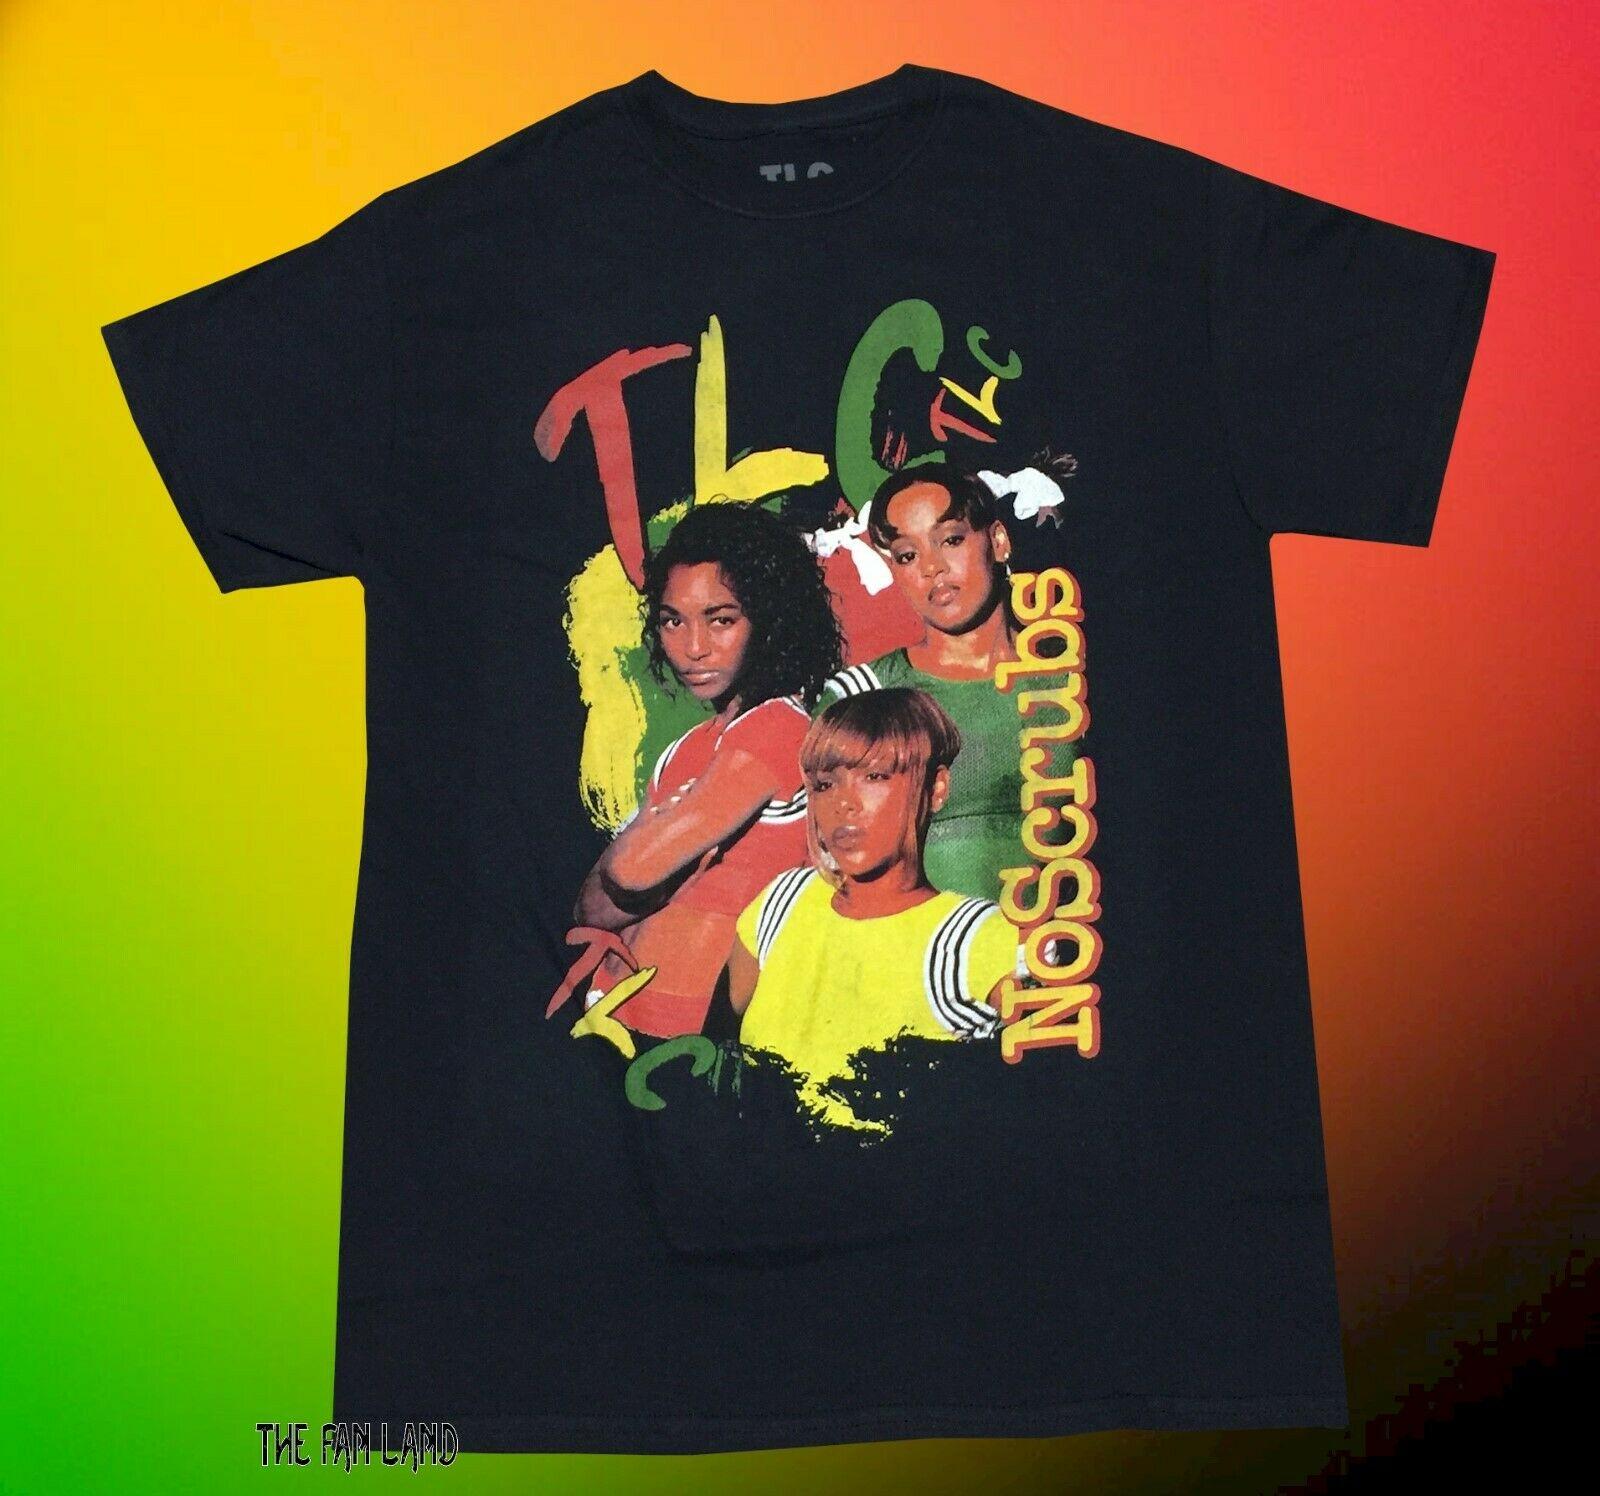 Novo tlc sem esfrega 1999 preto vintage camisa masculina t